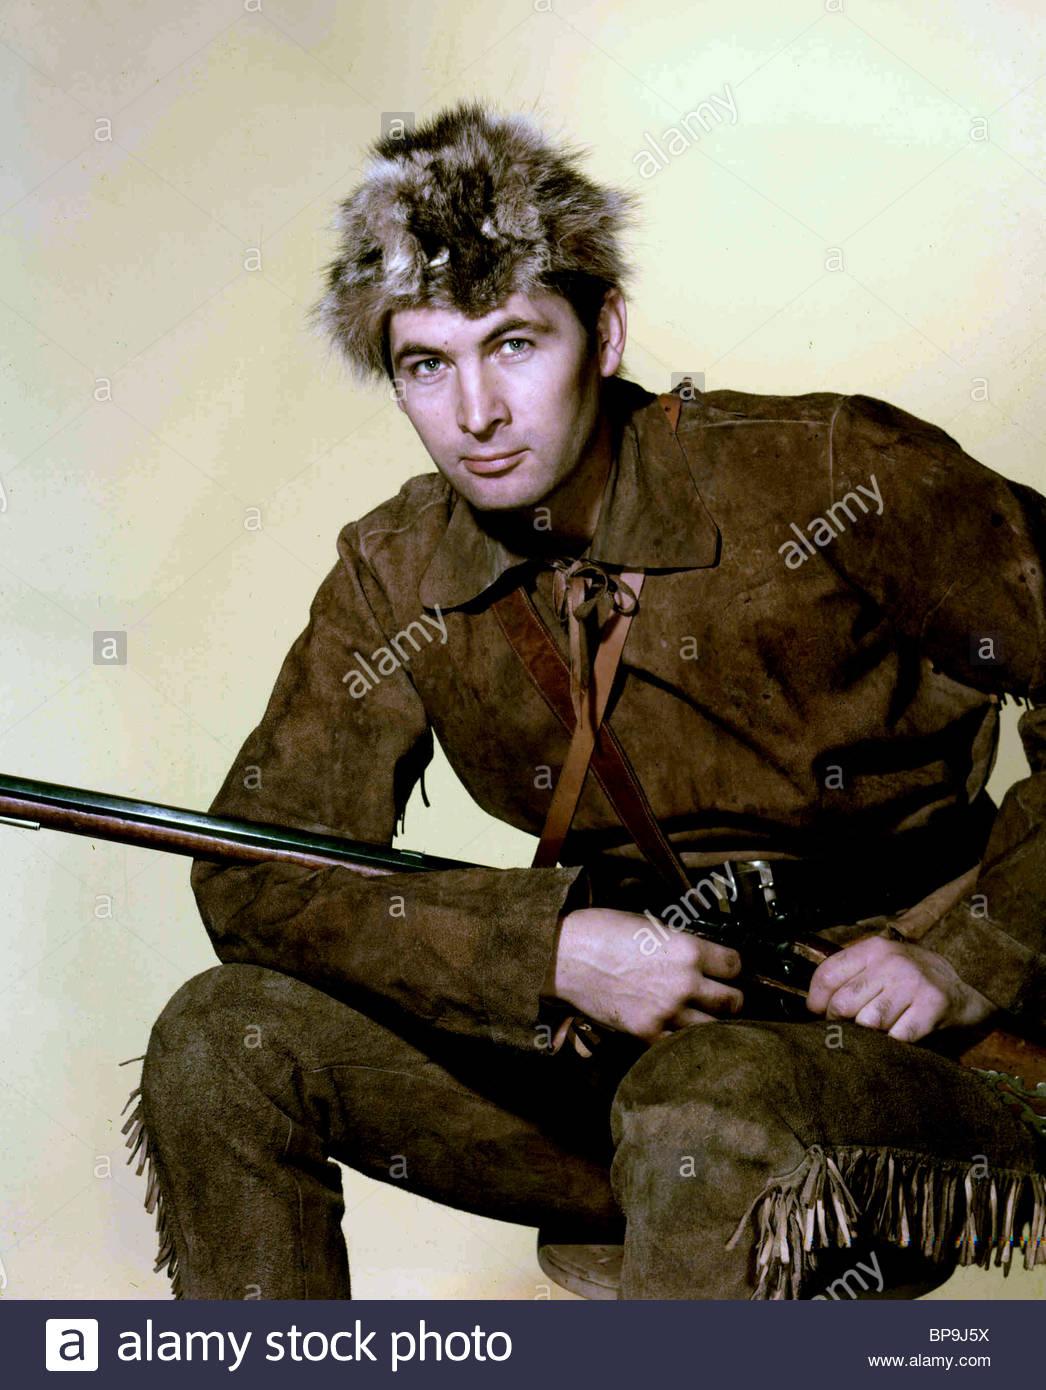 Daniel Boone Imágenes De Stock & Daniel Boone Fotos De Stock - Alamy